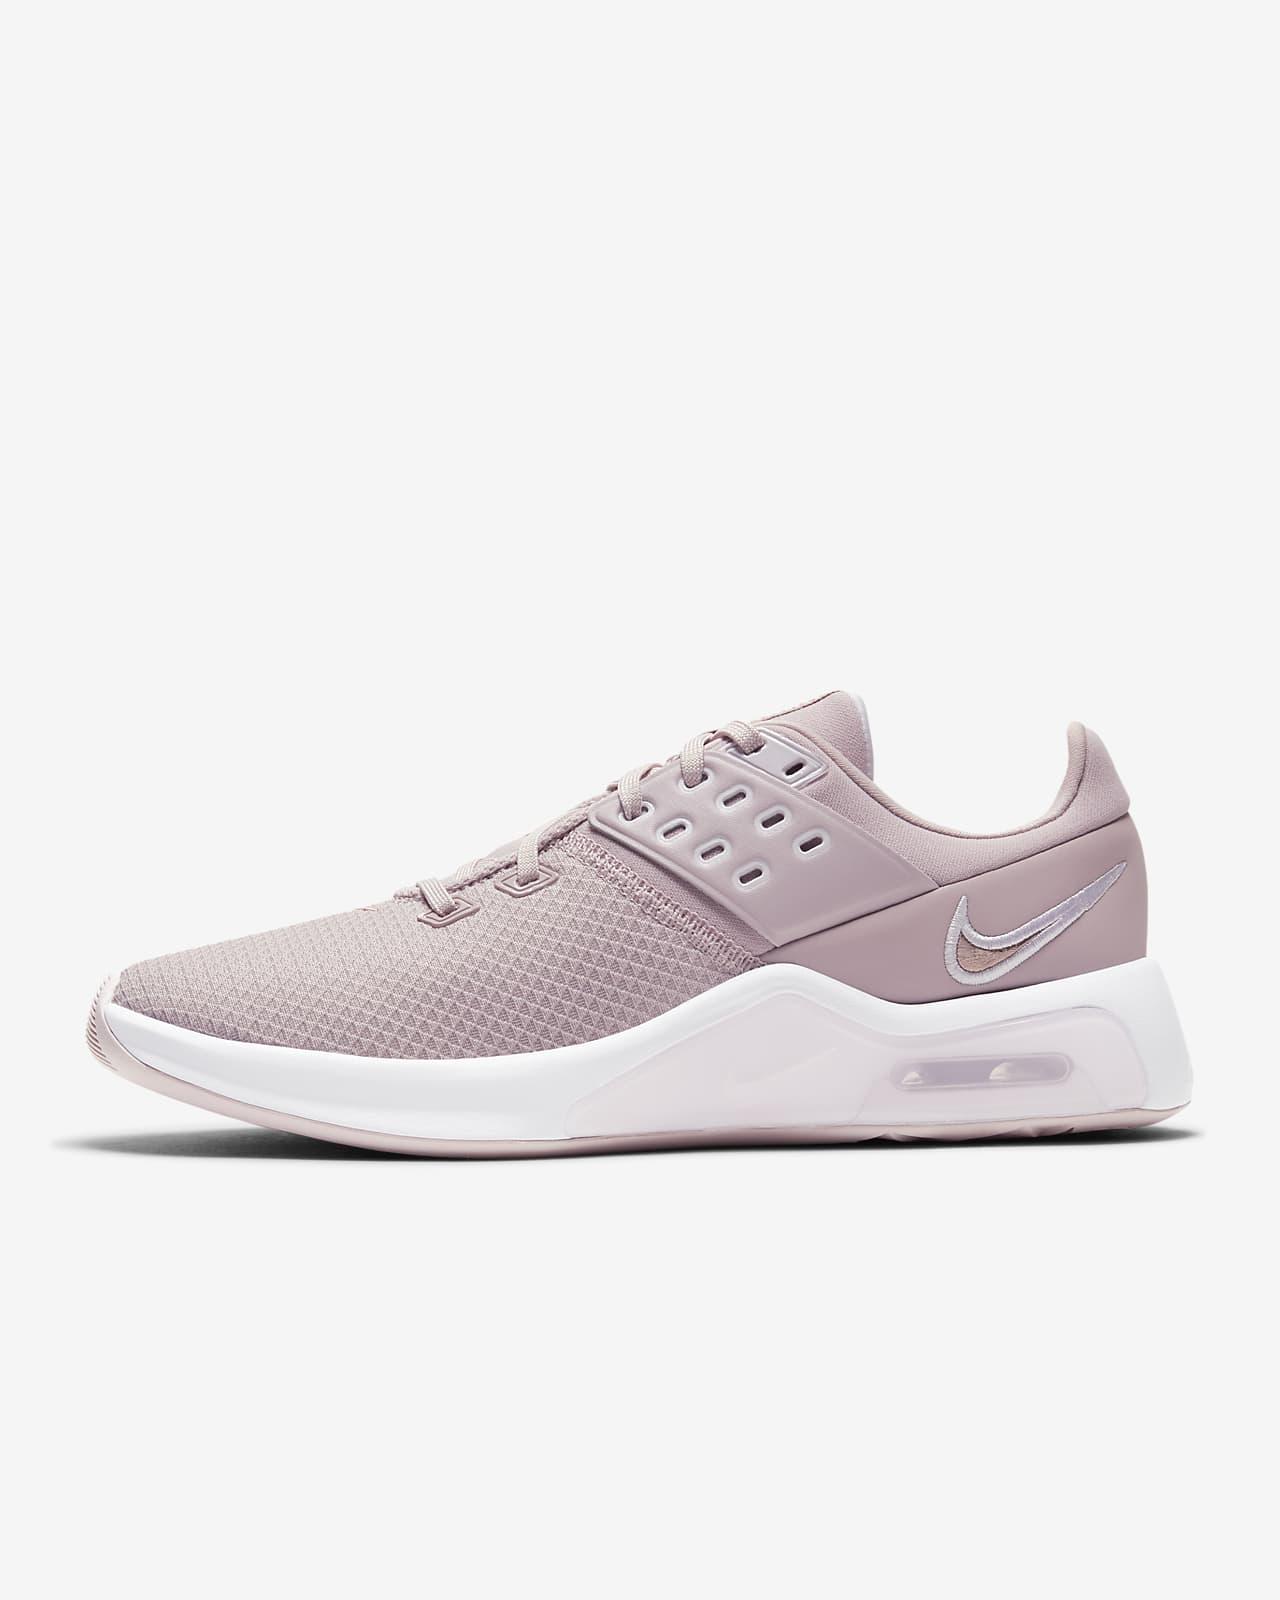 Nike Air Max Bella TR 4 Women's Training Shoe